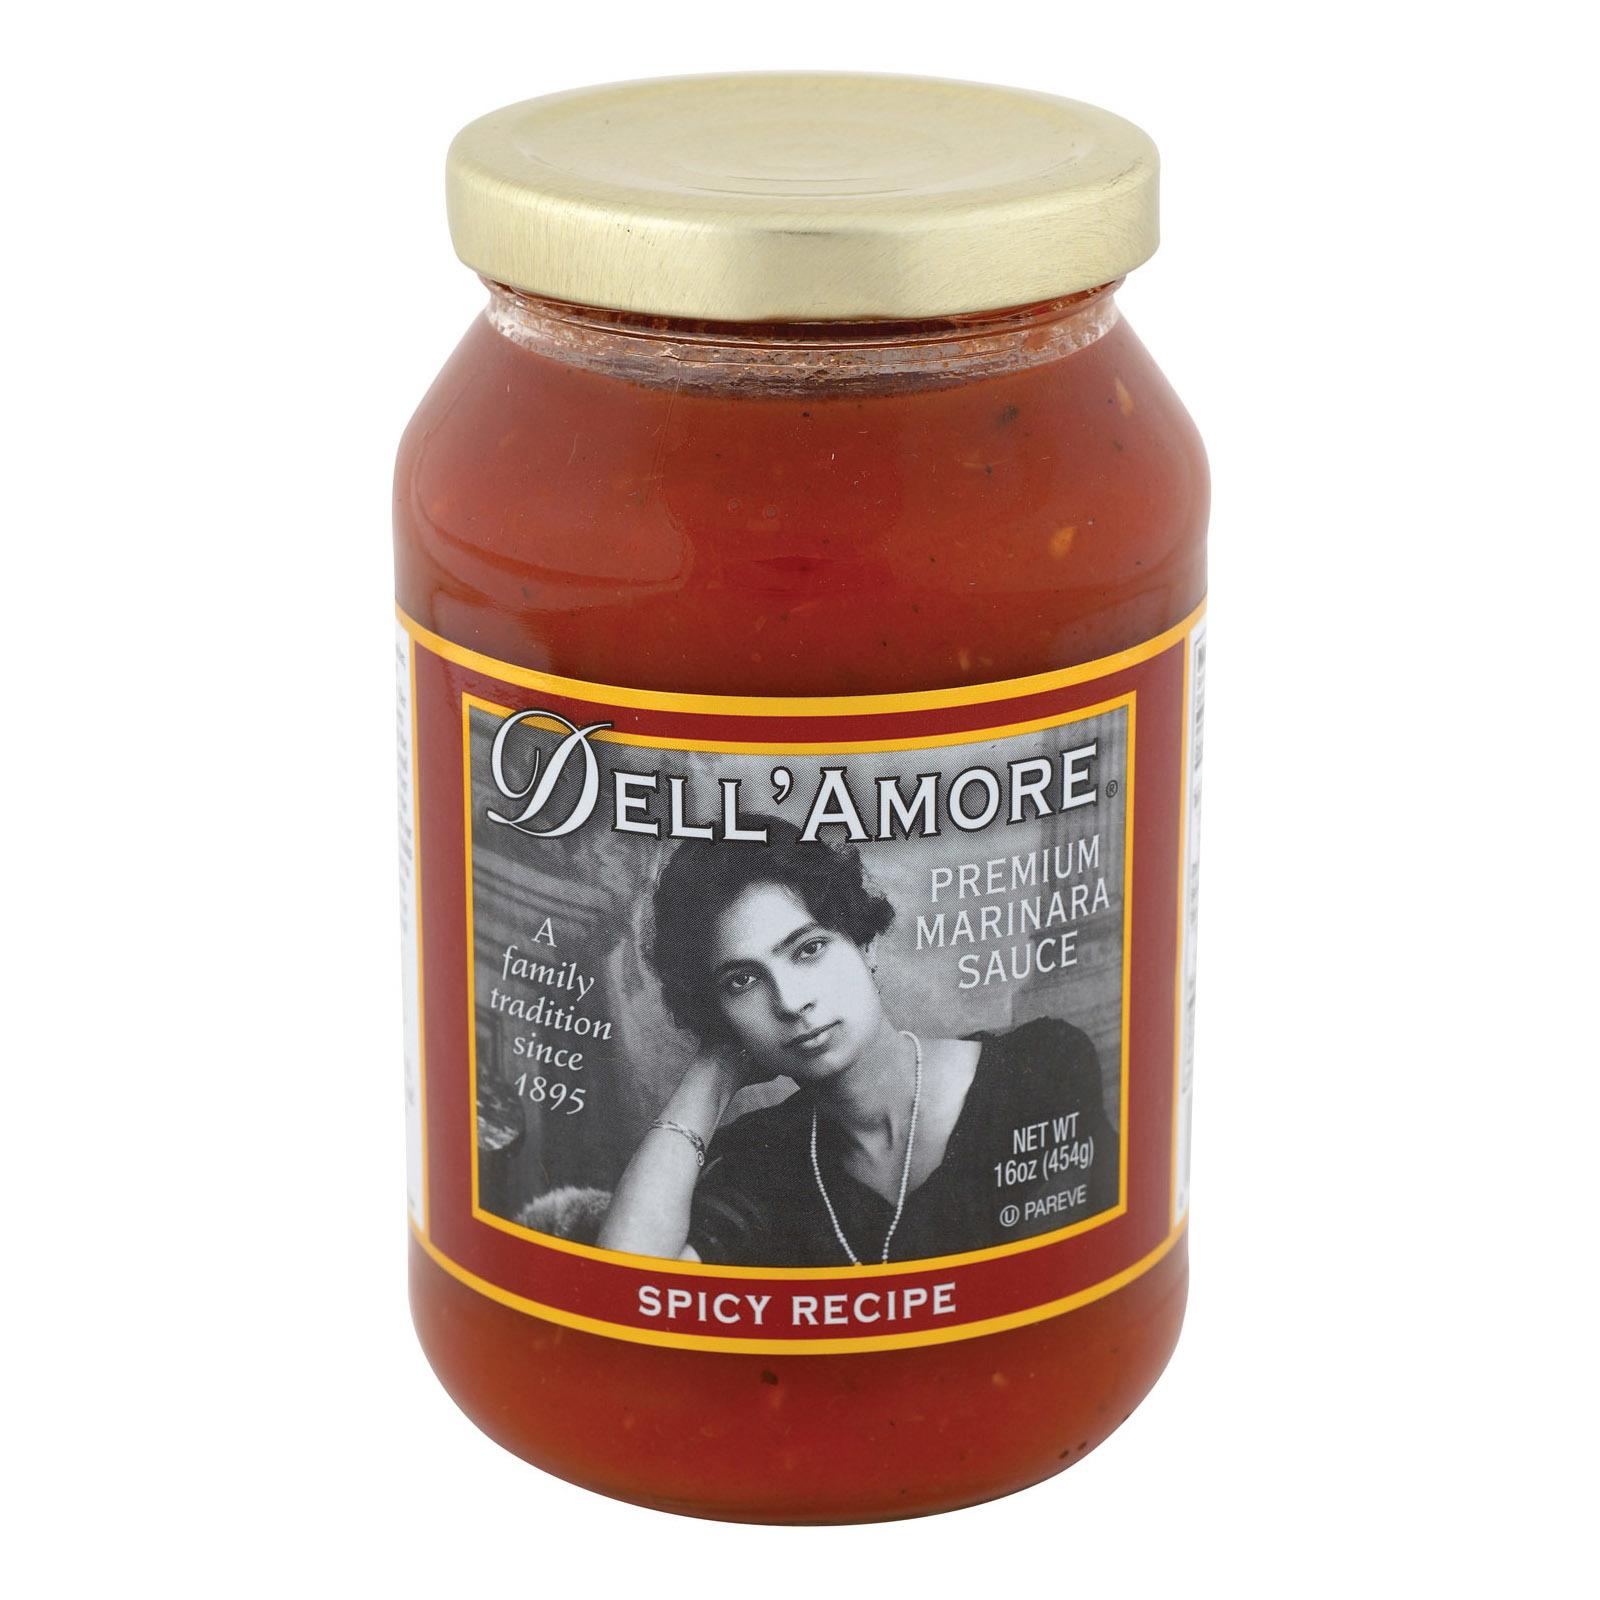 Dell Amore Spicy Marinara Sauce - Case of 12 - 16 fl oz